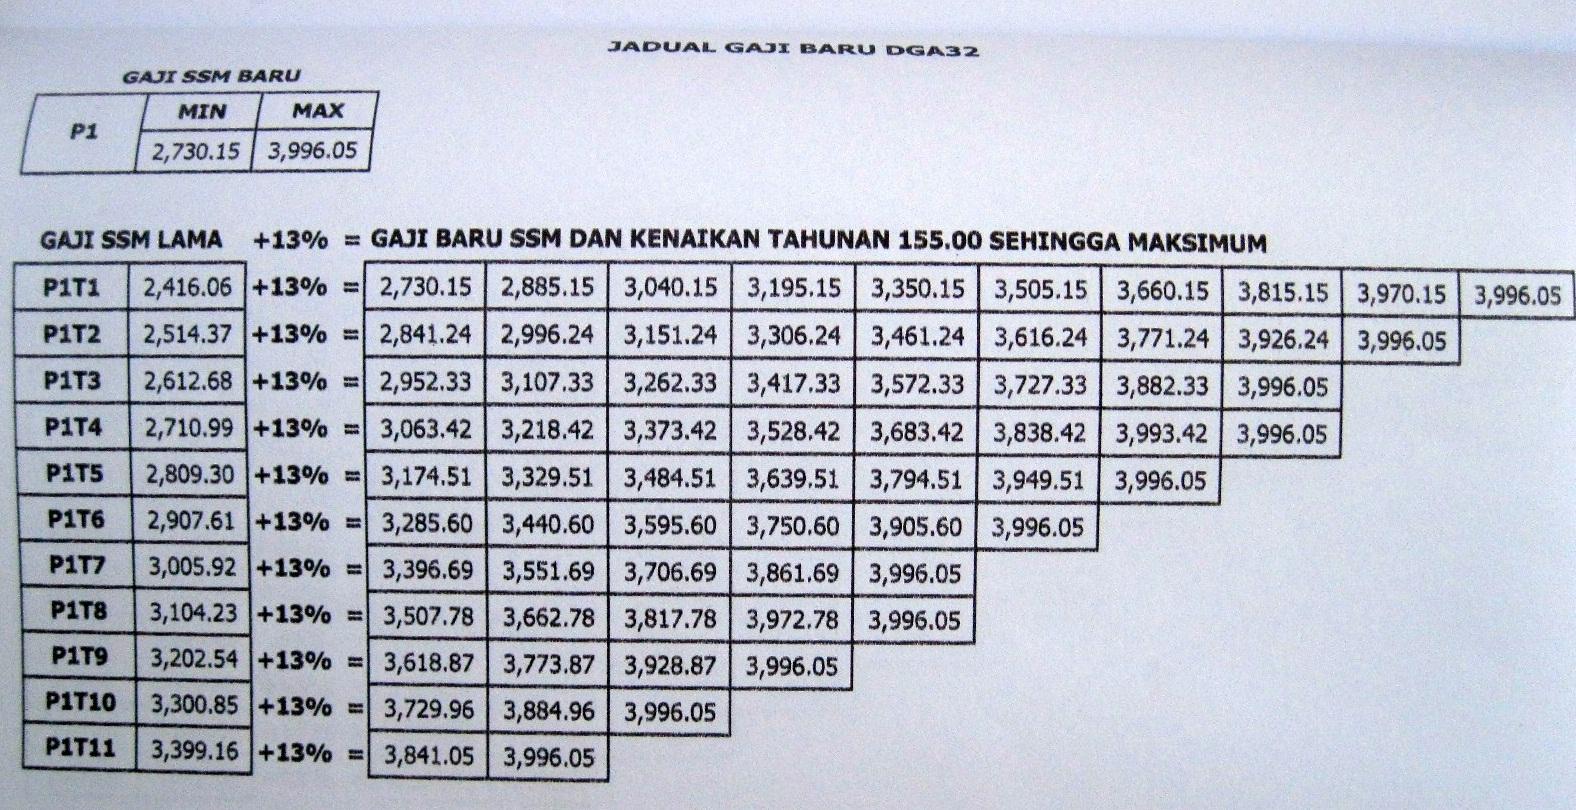 Jadual Gaji DG 41 http://www.ciklaili.com/2012/05/gred-gaji-baru-ssm